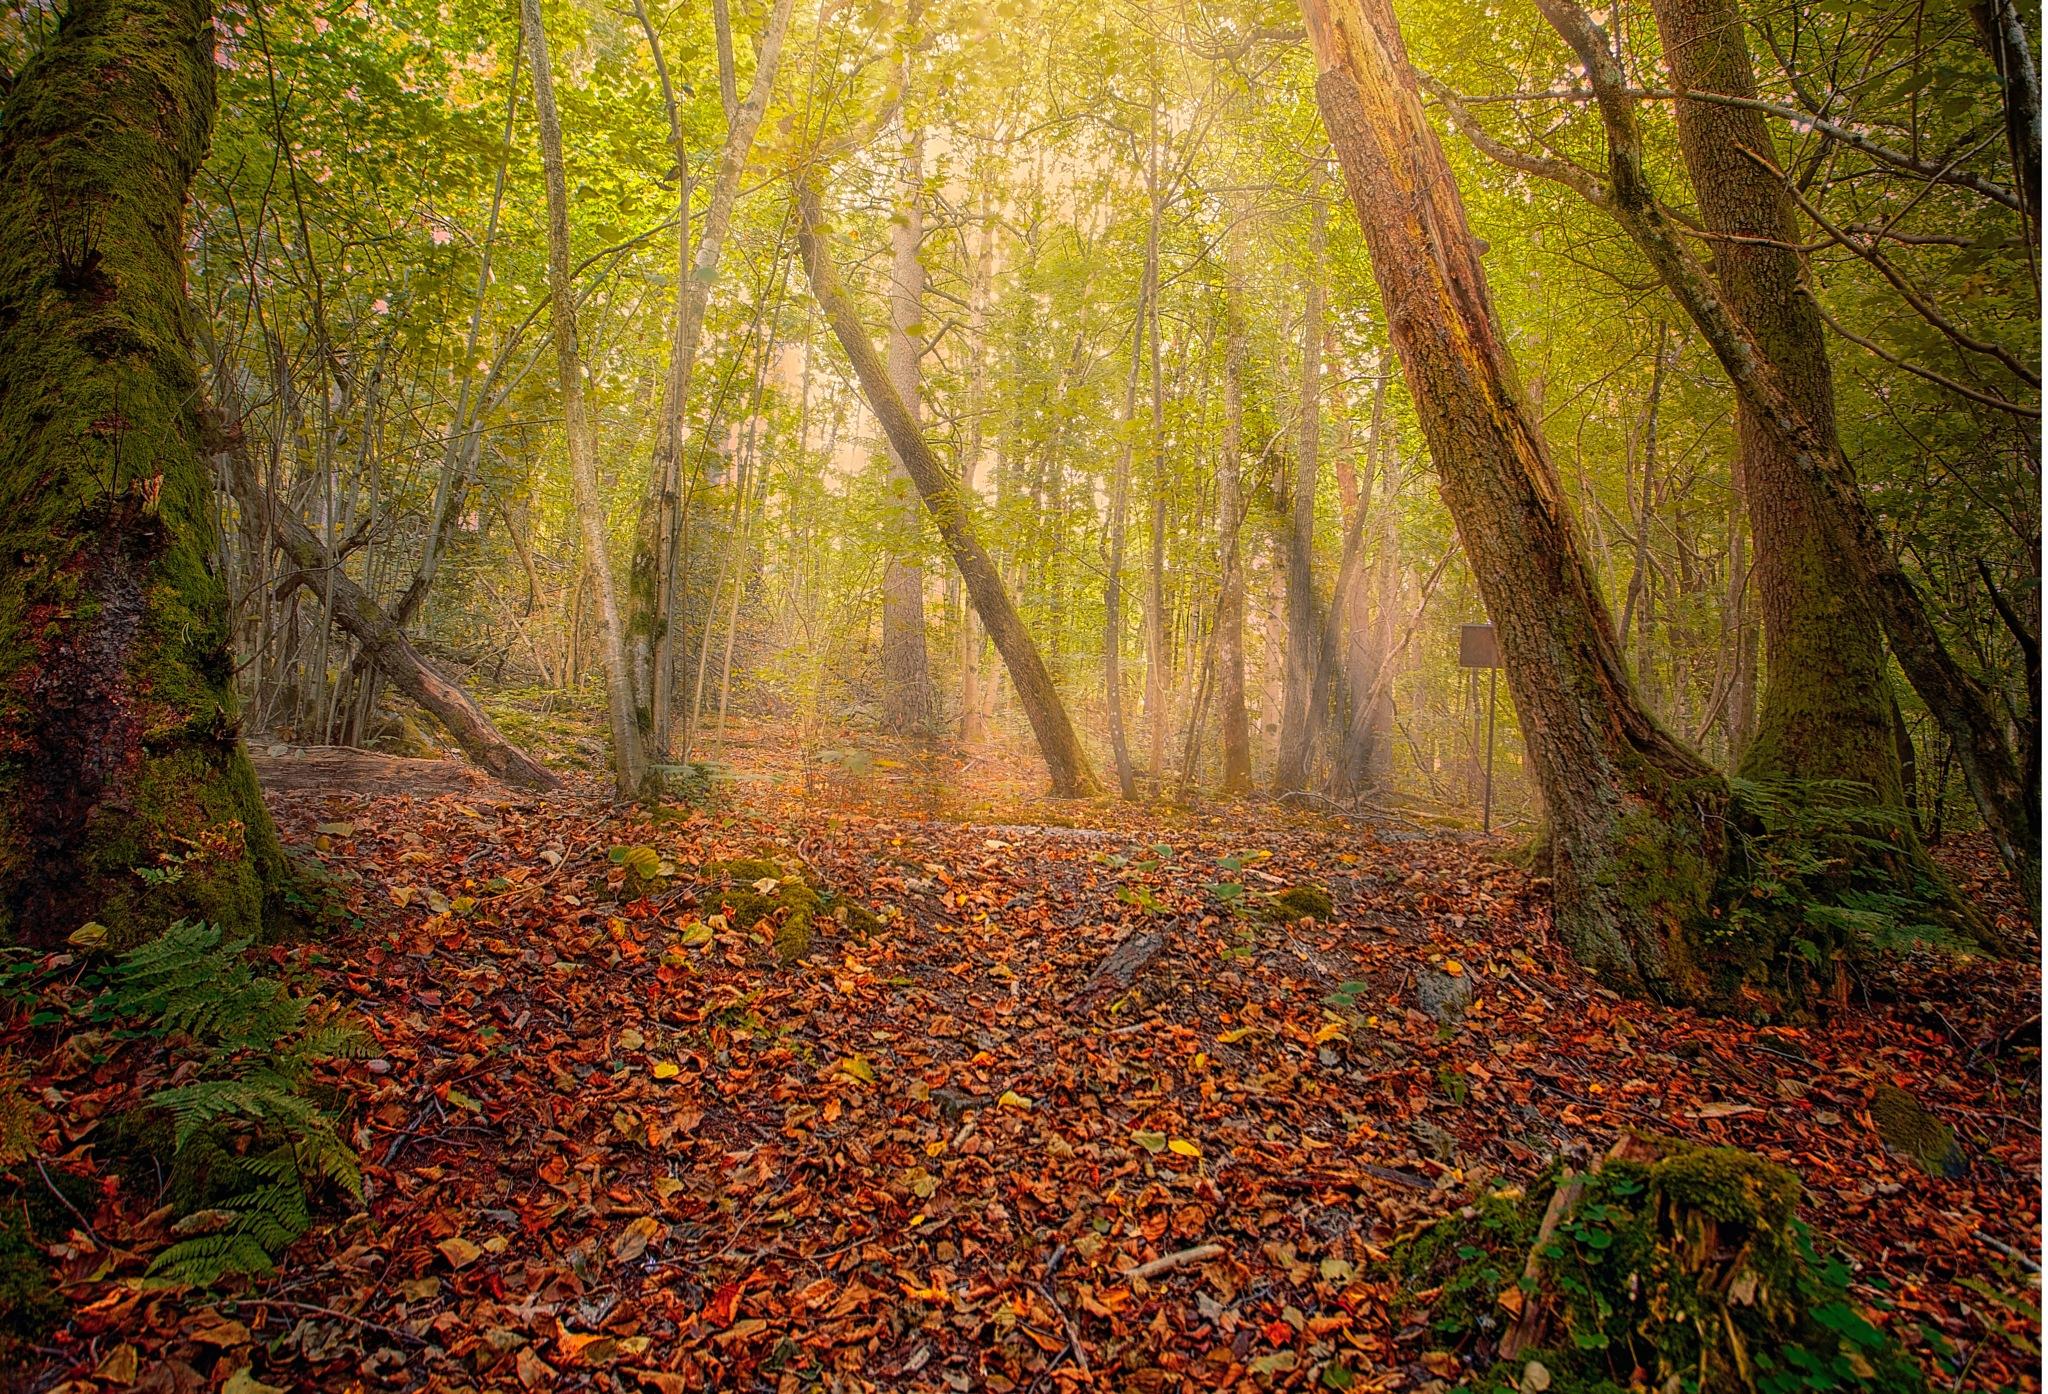 Misty Forest  by Mattias Borg